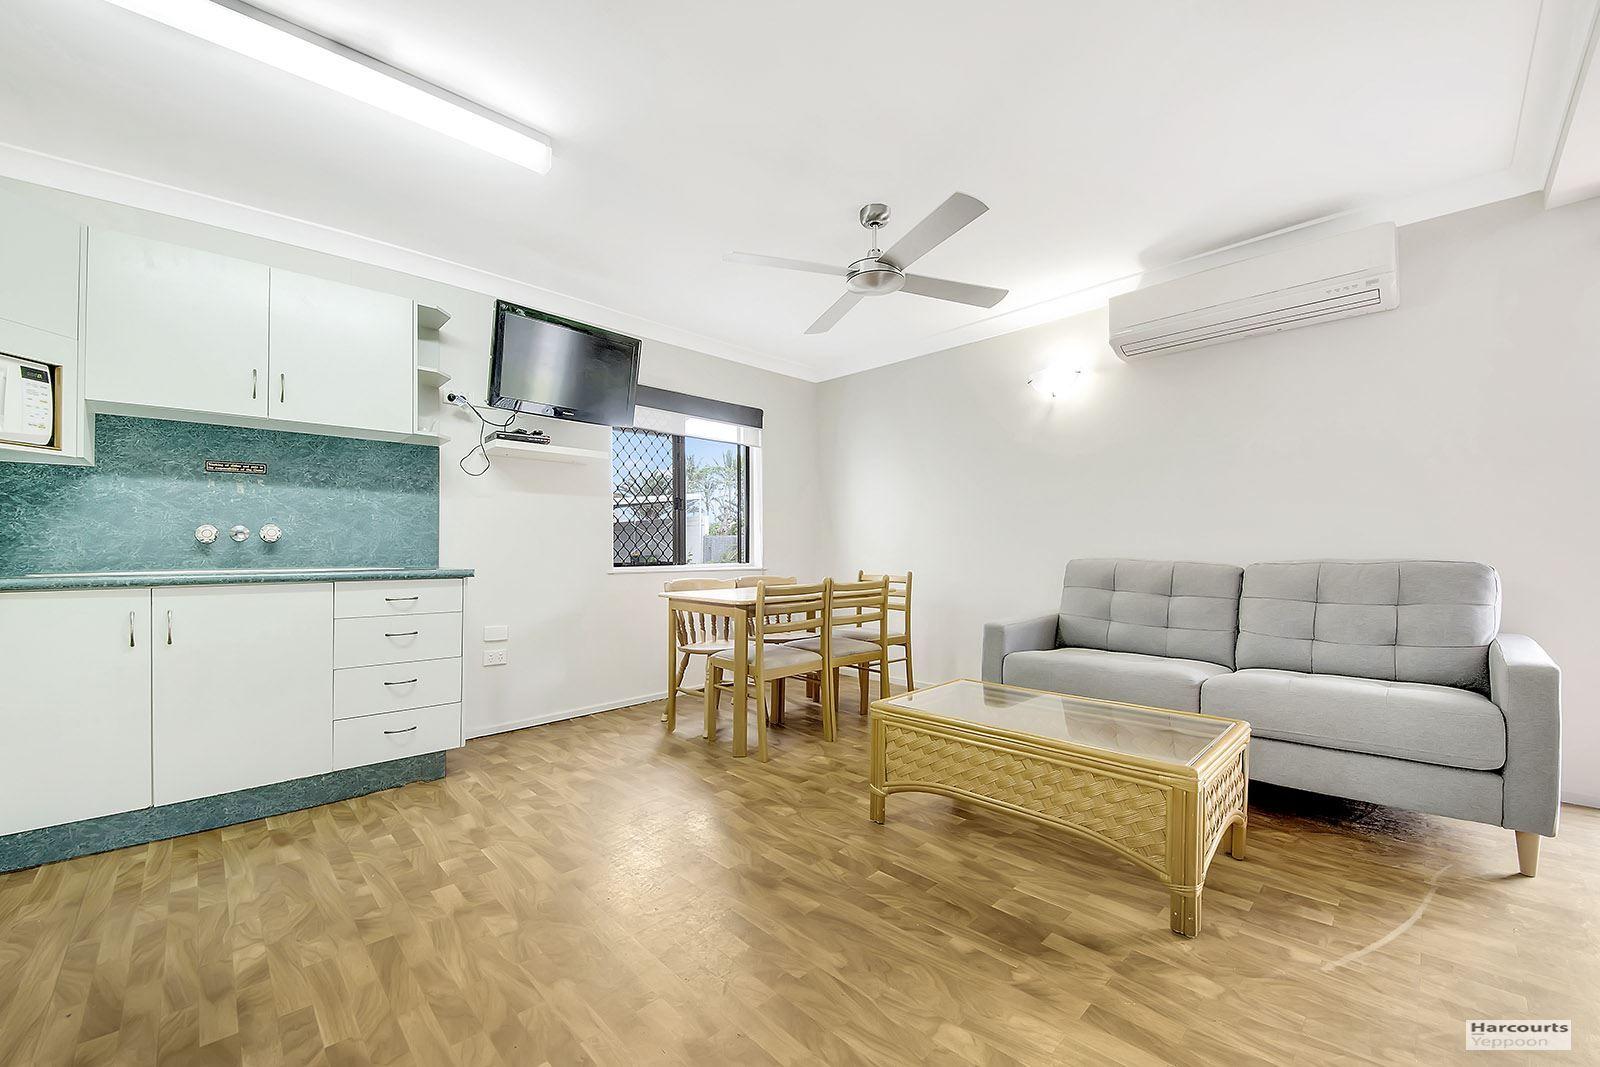 1/5-7 Todd Avenue - Driftwood Motel, Yeppoon QLD 4703, Image 2